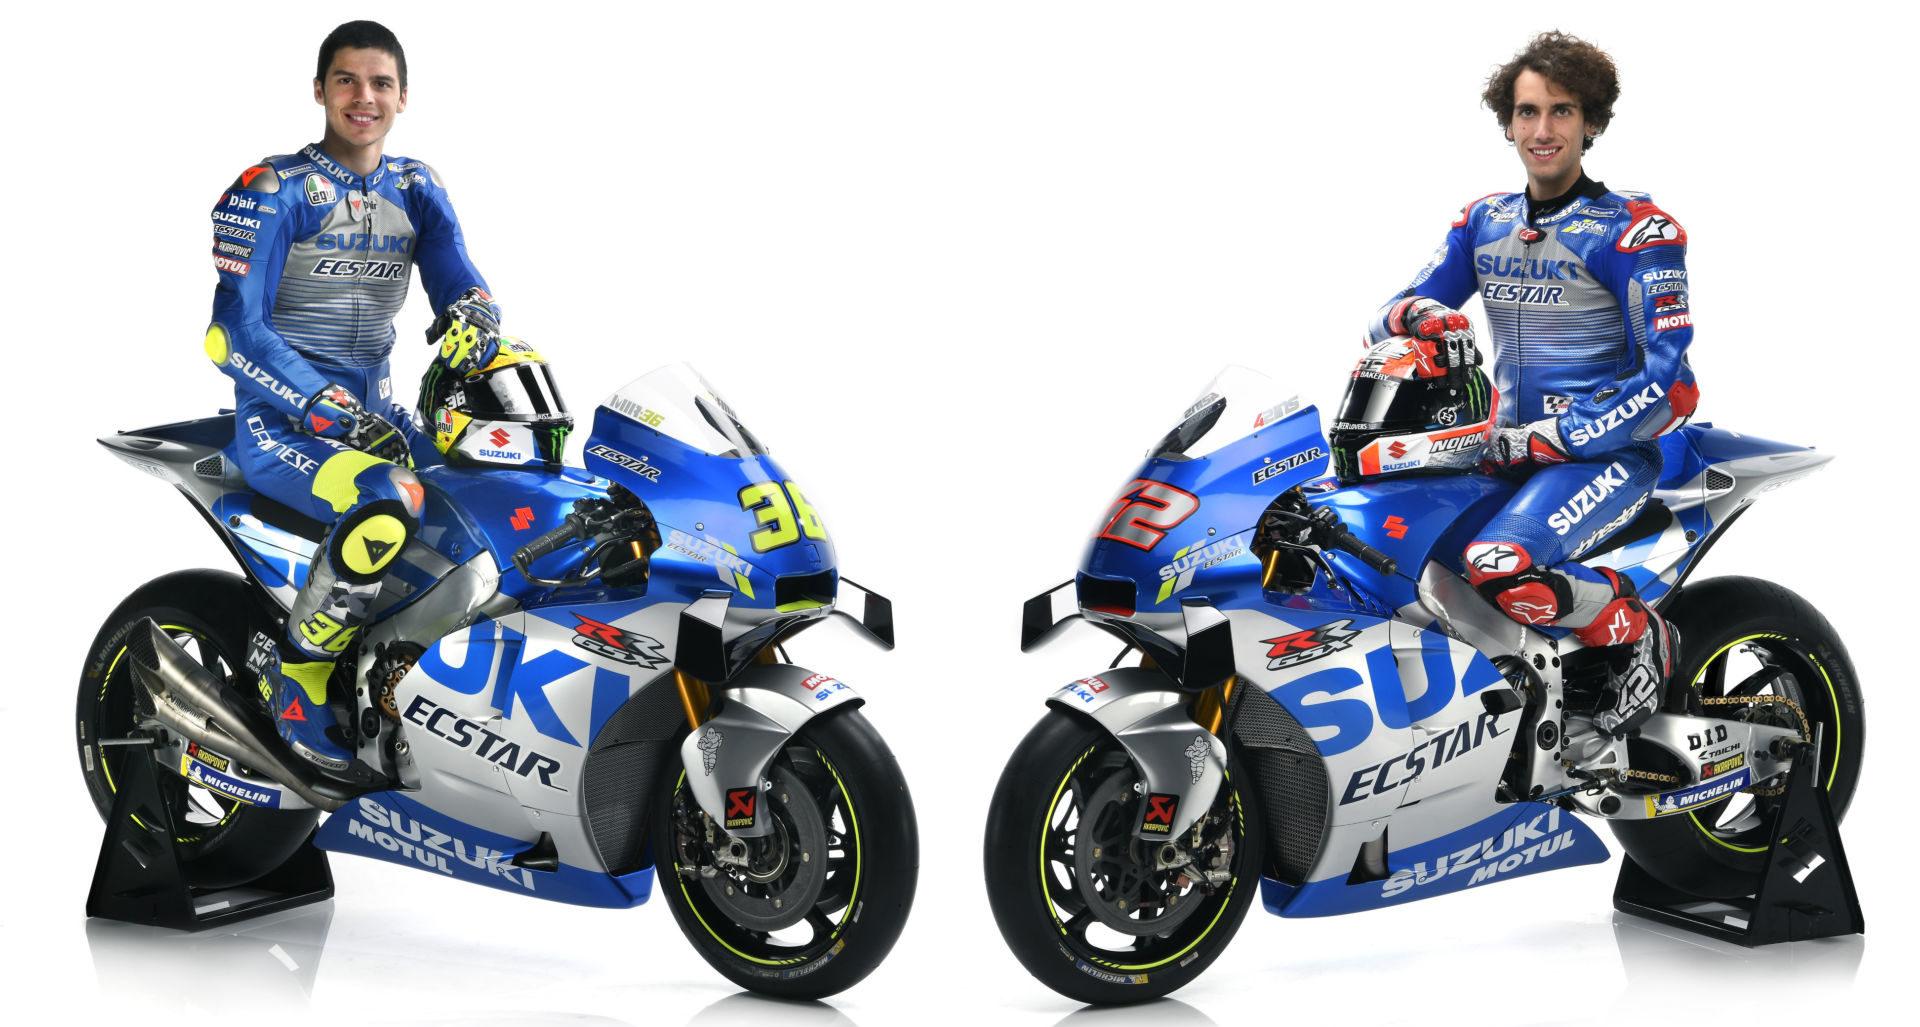 Team Suzuki ECSTAR's Joan Mir (left) and Alex Rins (right) and their GSX-RR racebikes. Photo courtesy of Team Suzuki Press Office.